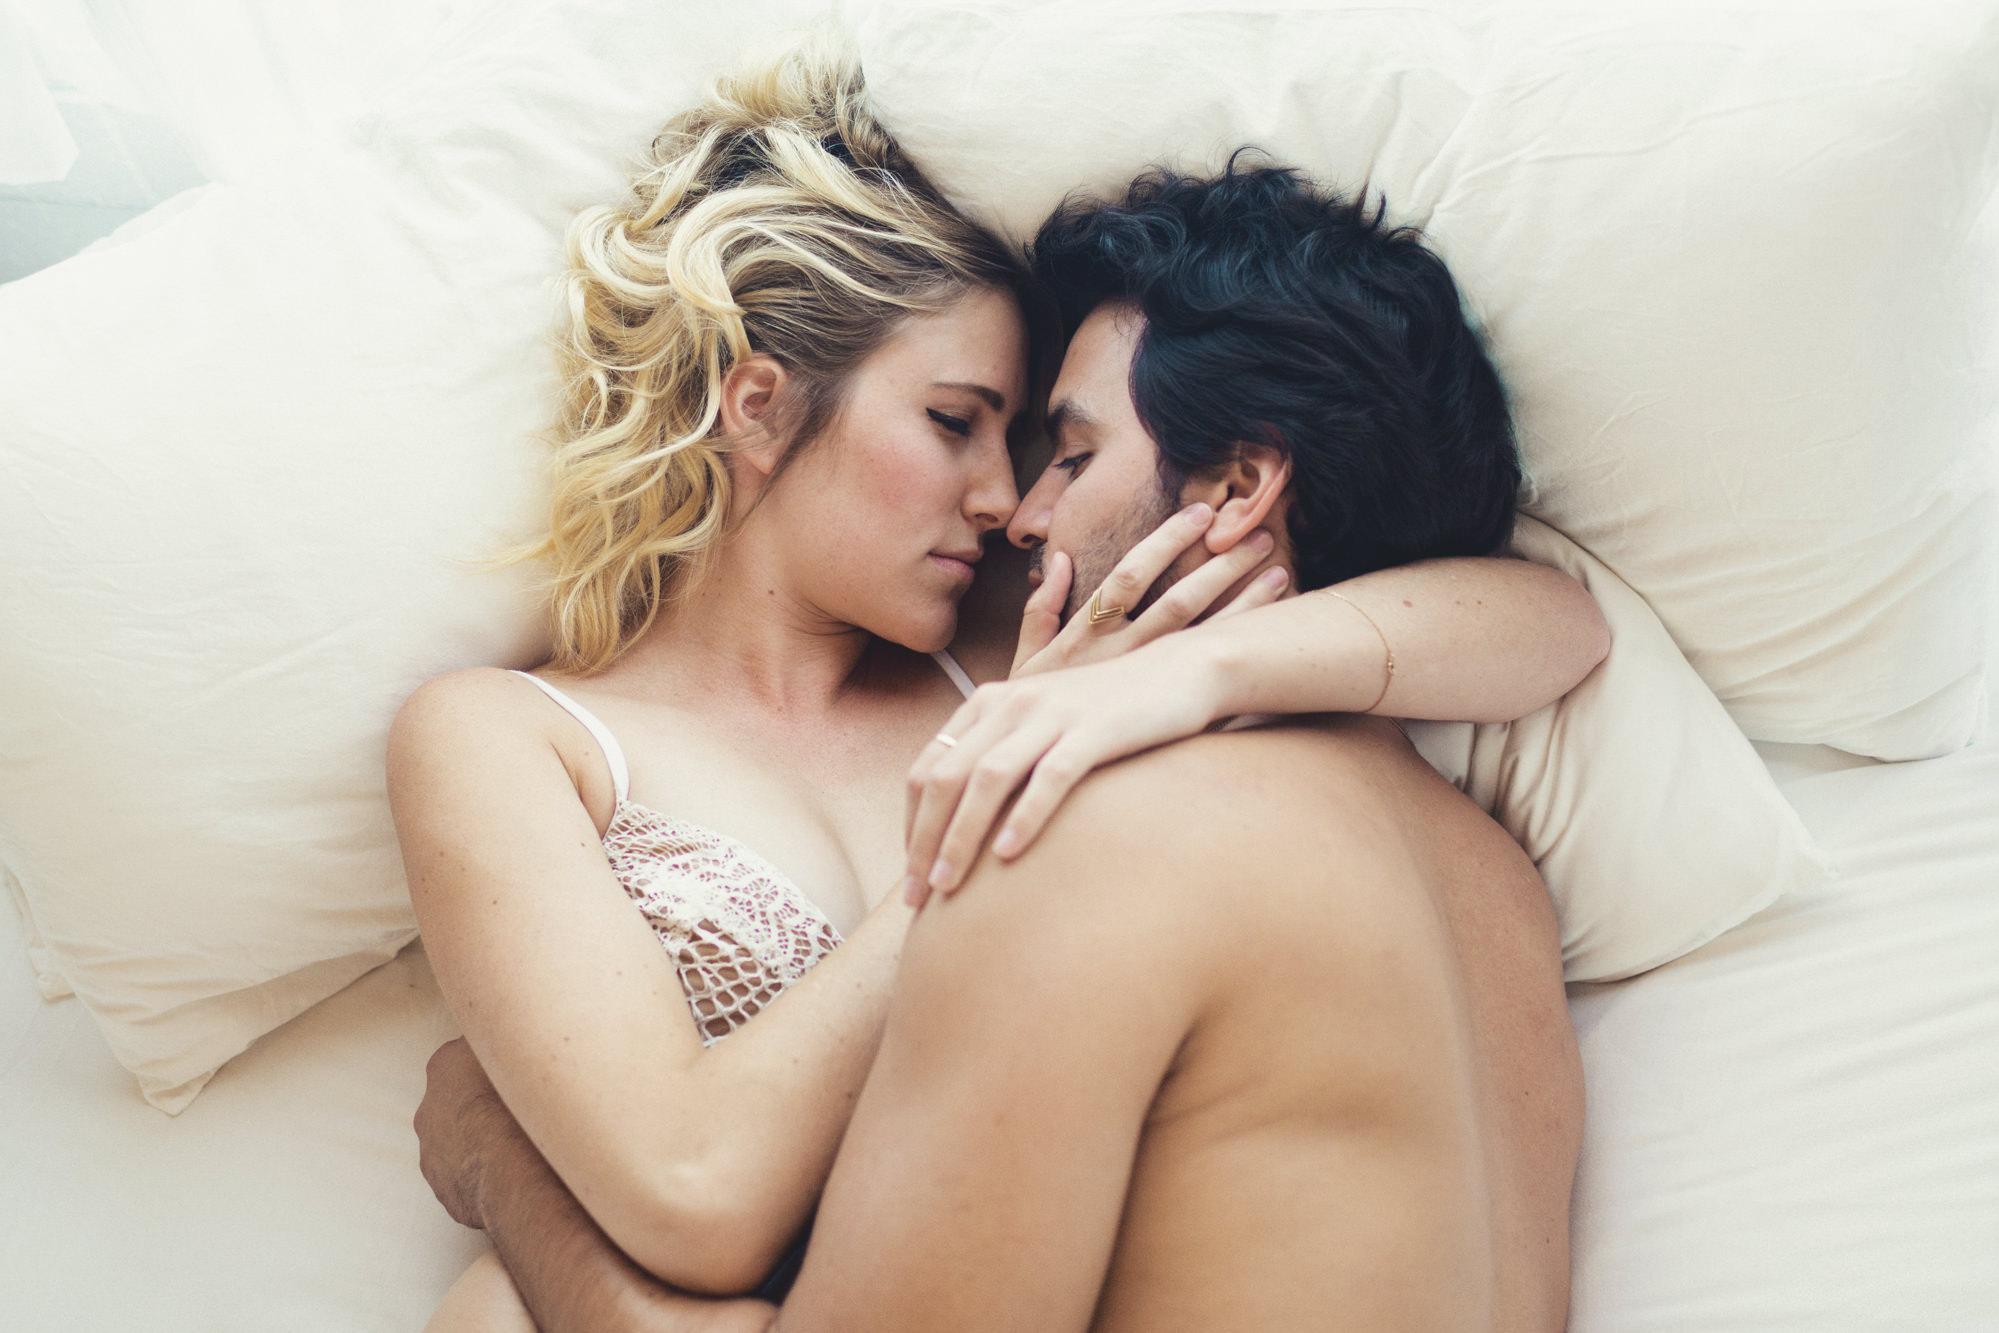 Muy oldneket porno sexo video